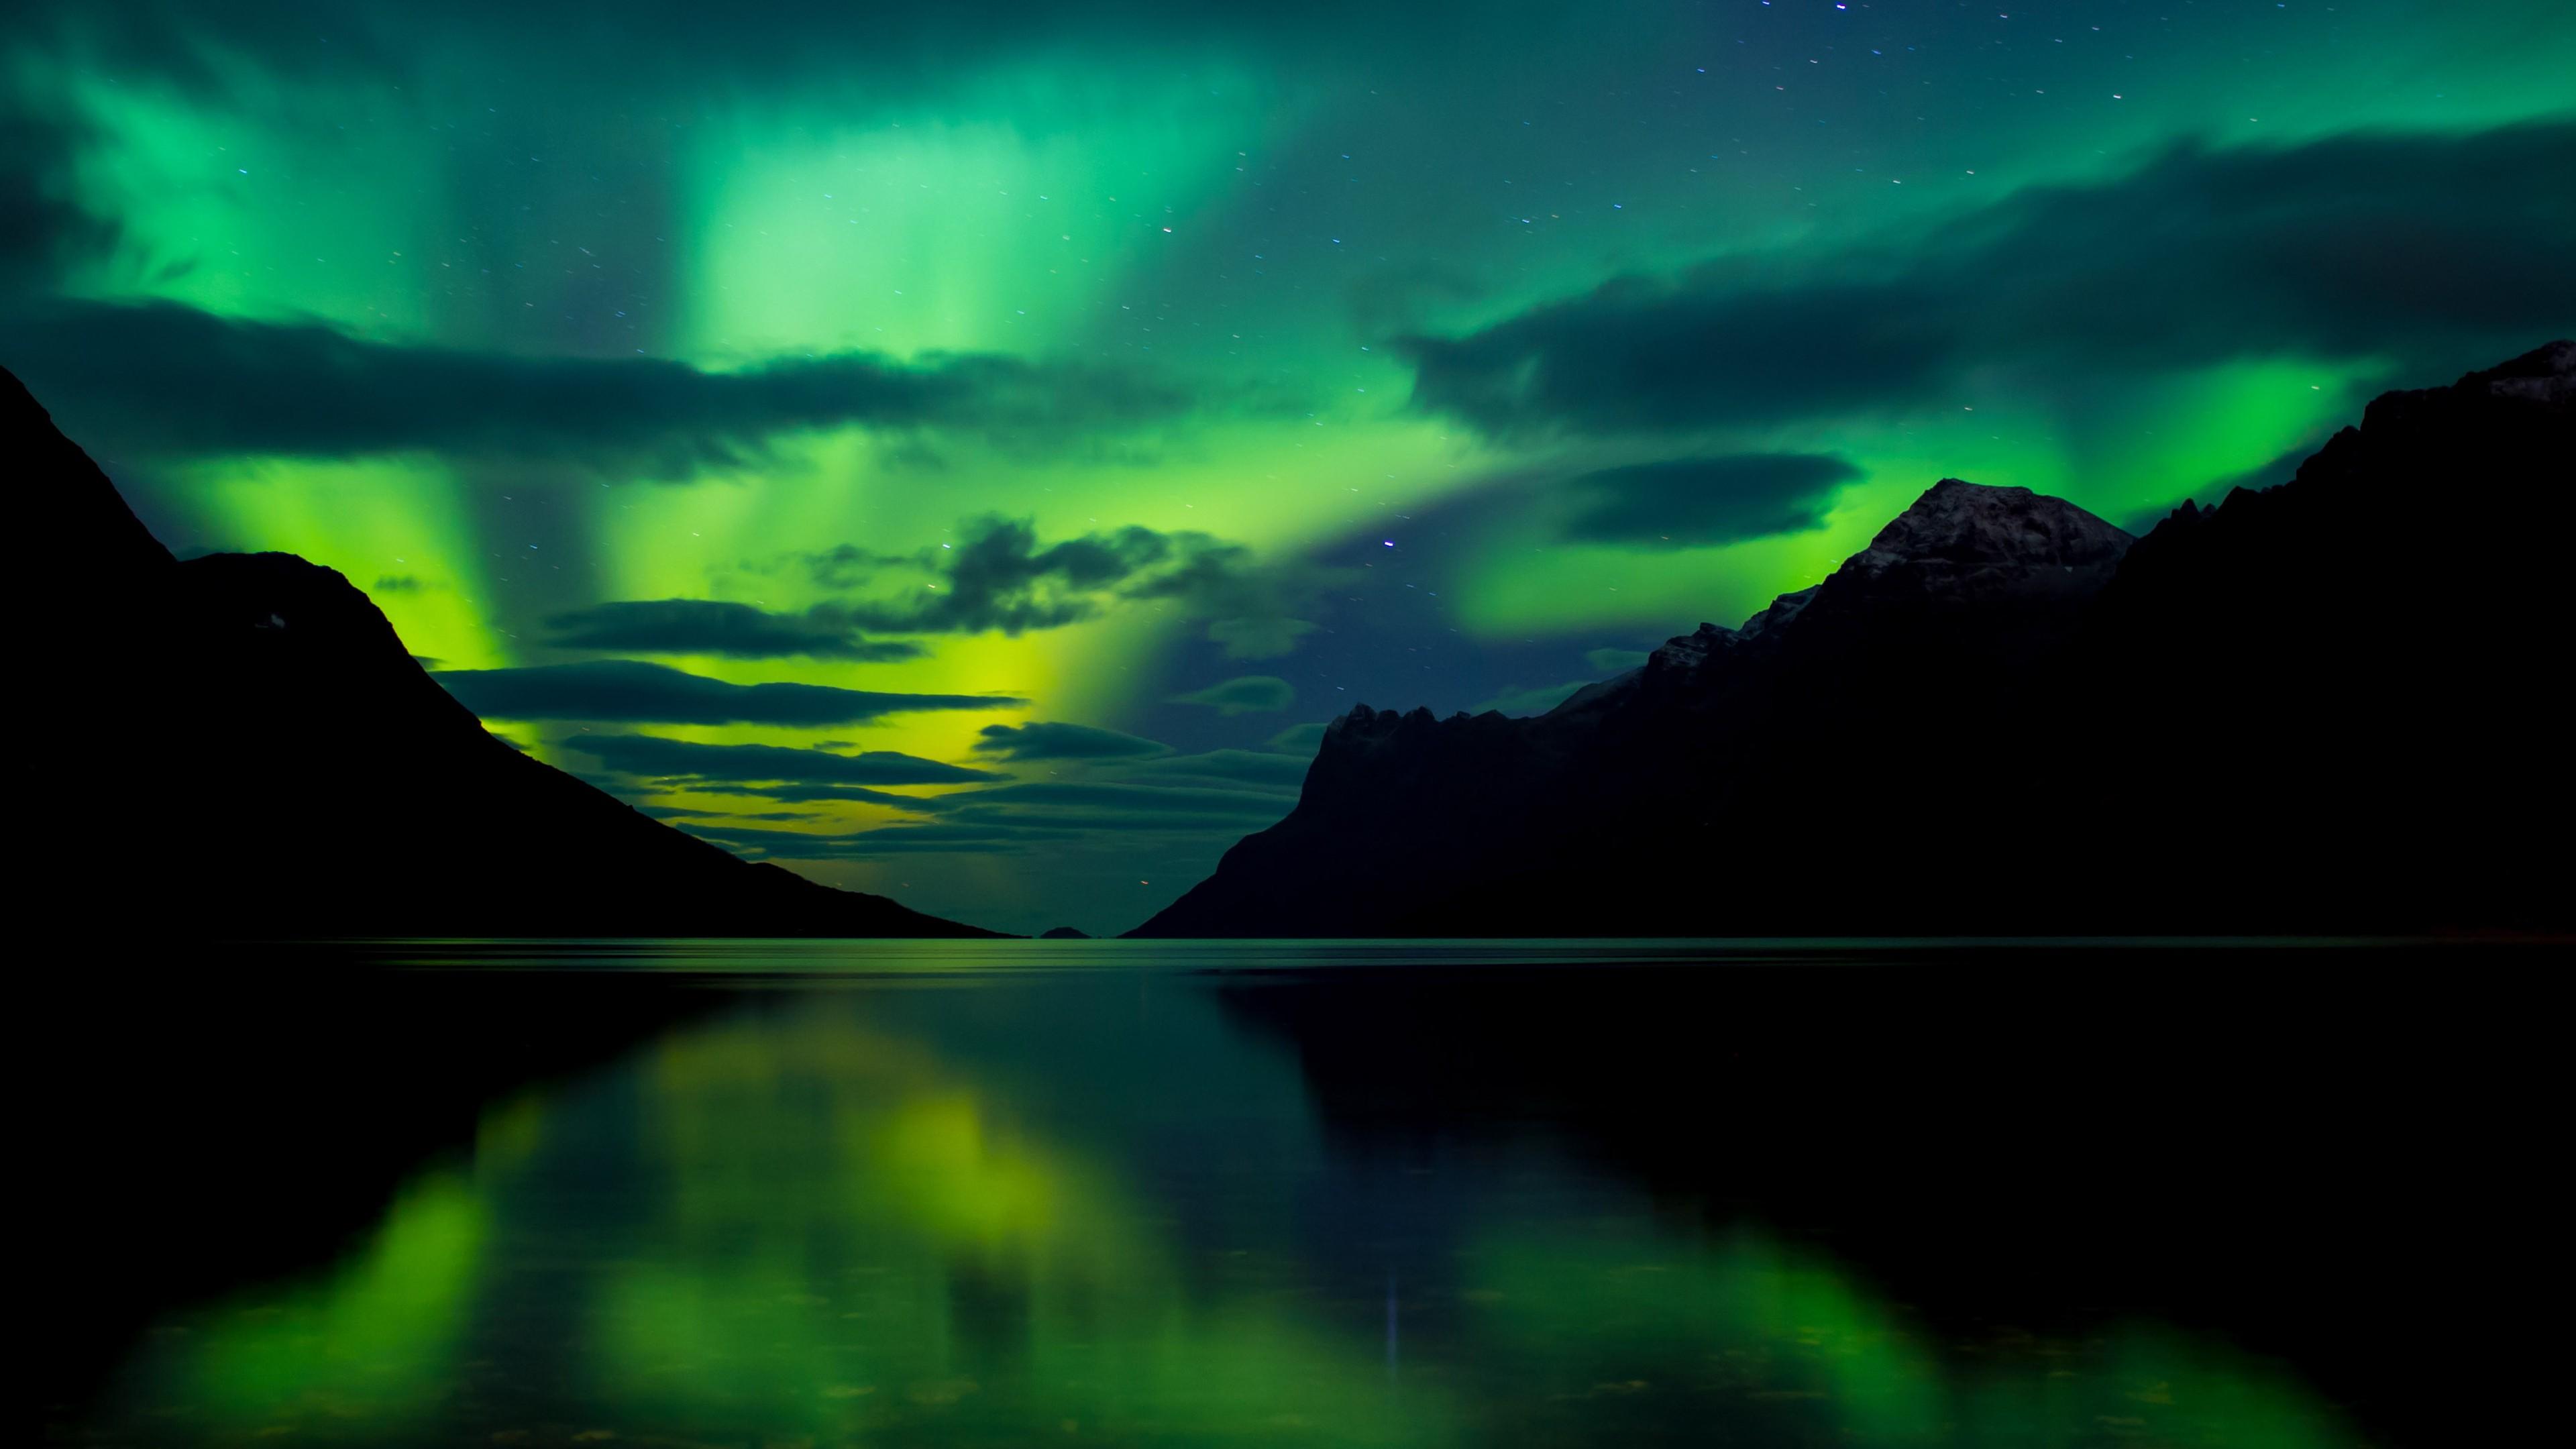 4k Hd Wallapaper: Wallpaper Aurora Borealis, 5k, 4k Wallpaper, Abisko